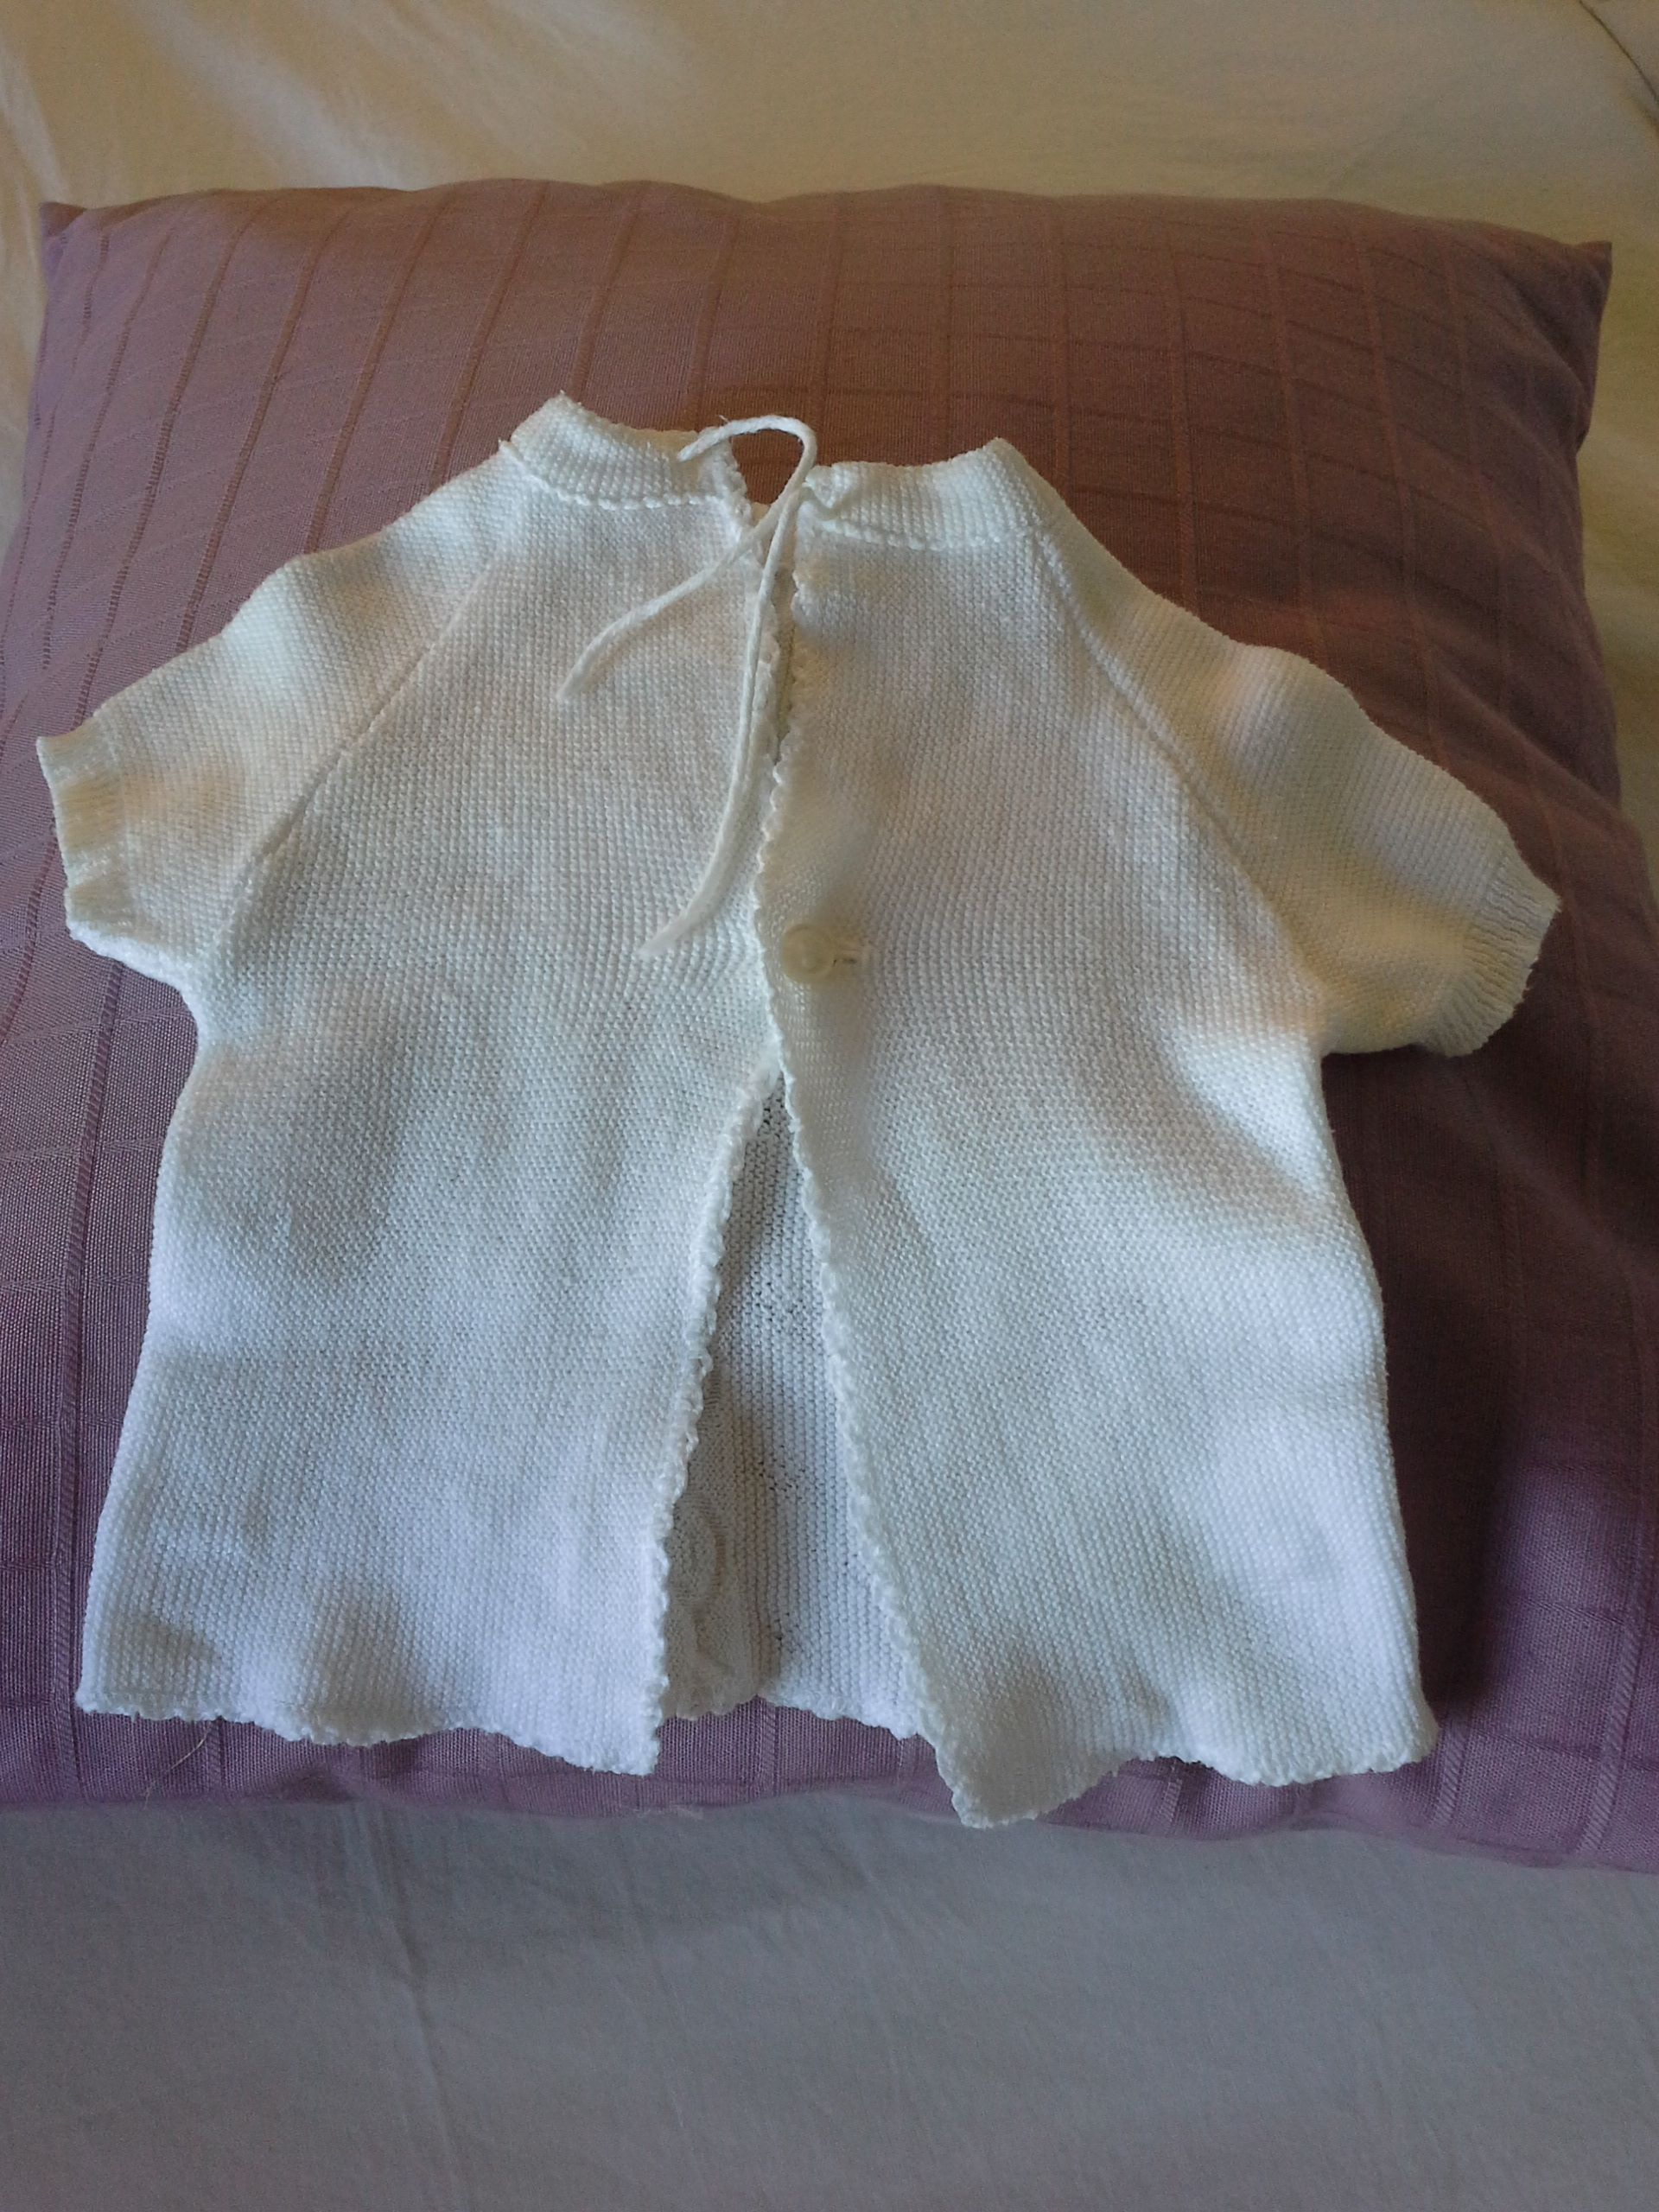 #Babyvintage find #crochet #babyjacket